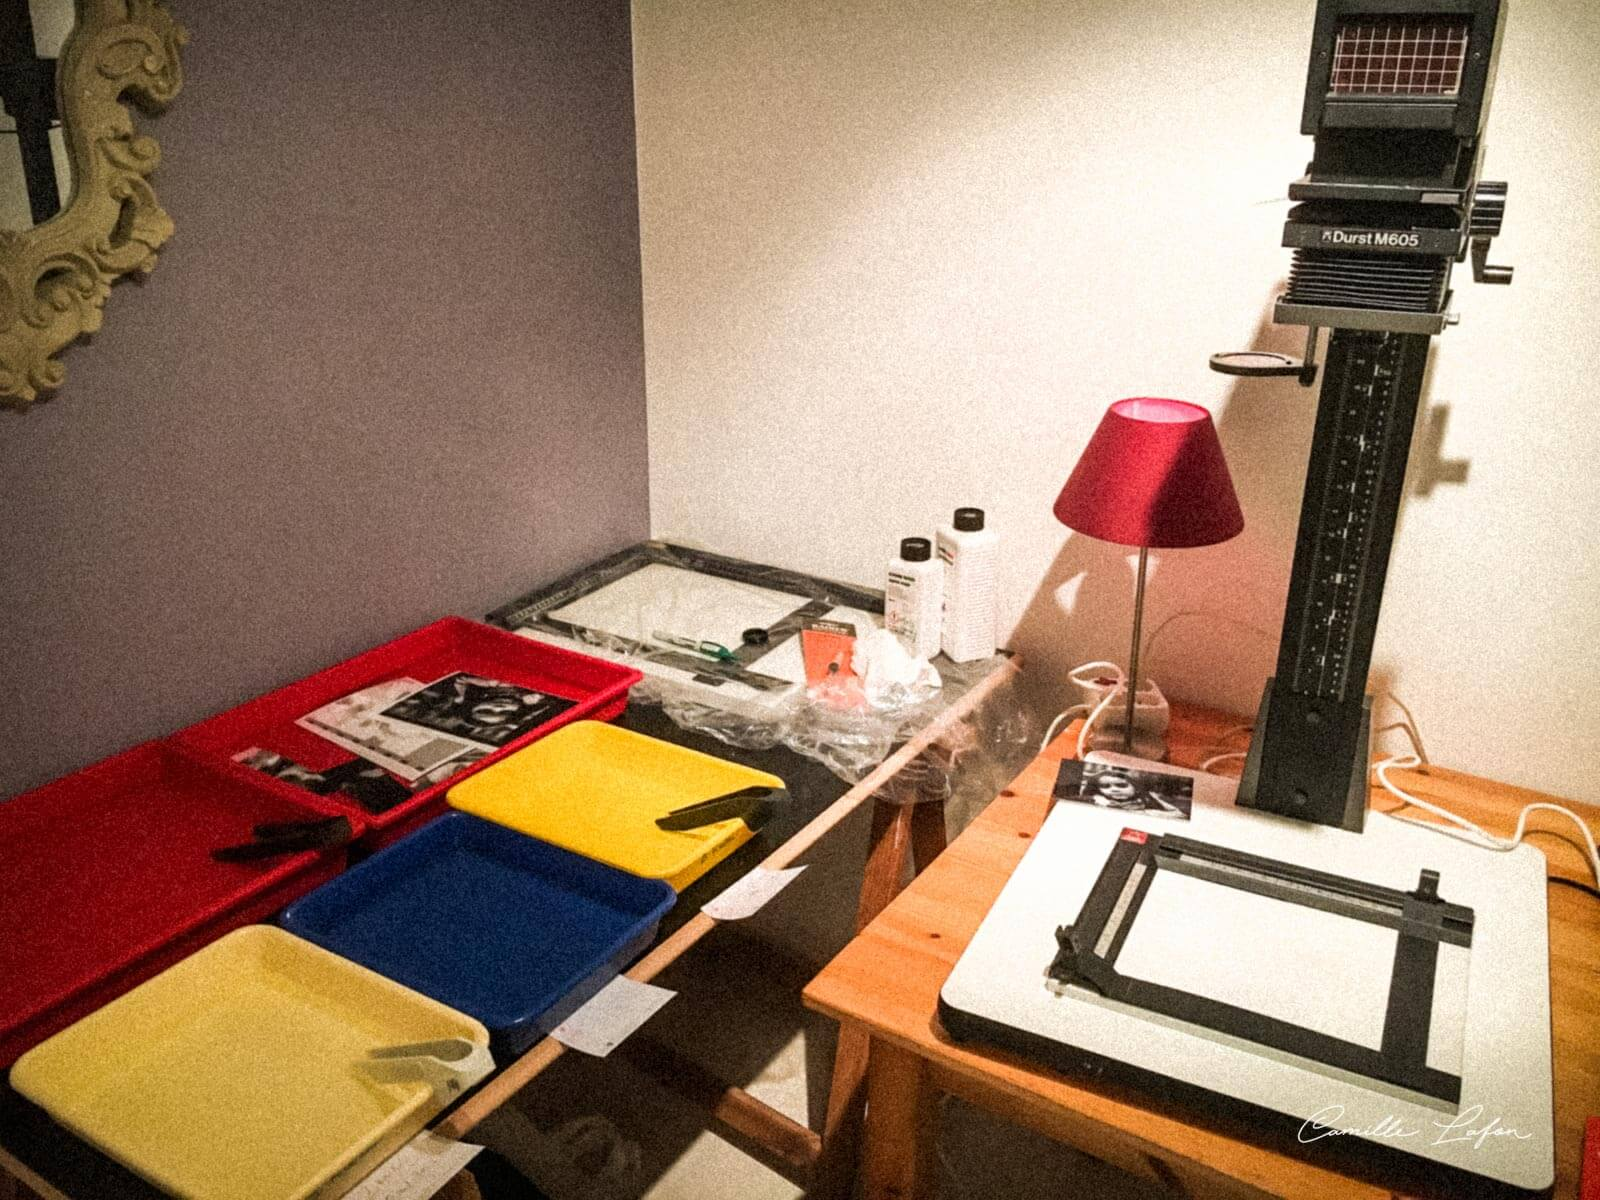 laboratoire-photo-argentique-studio-montpellier